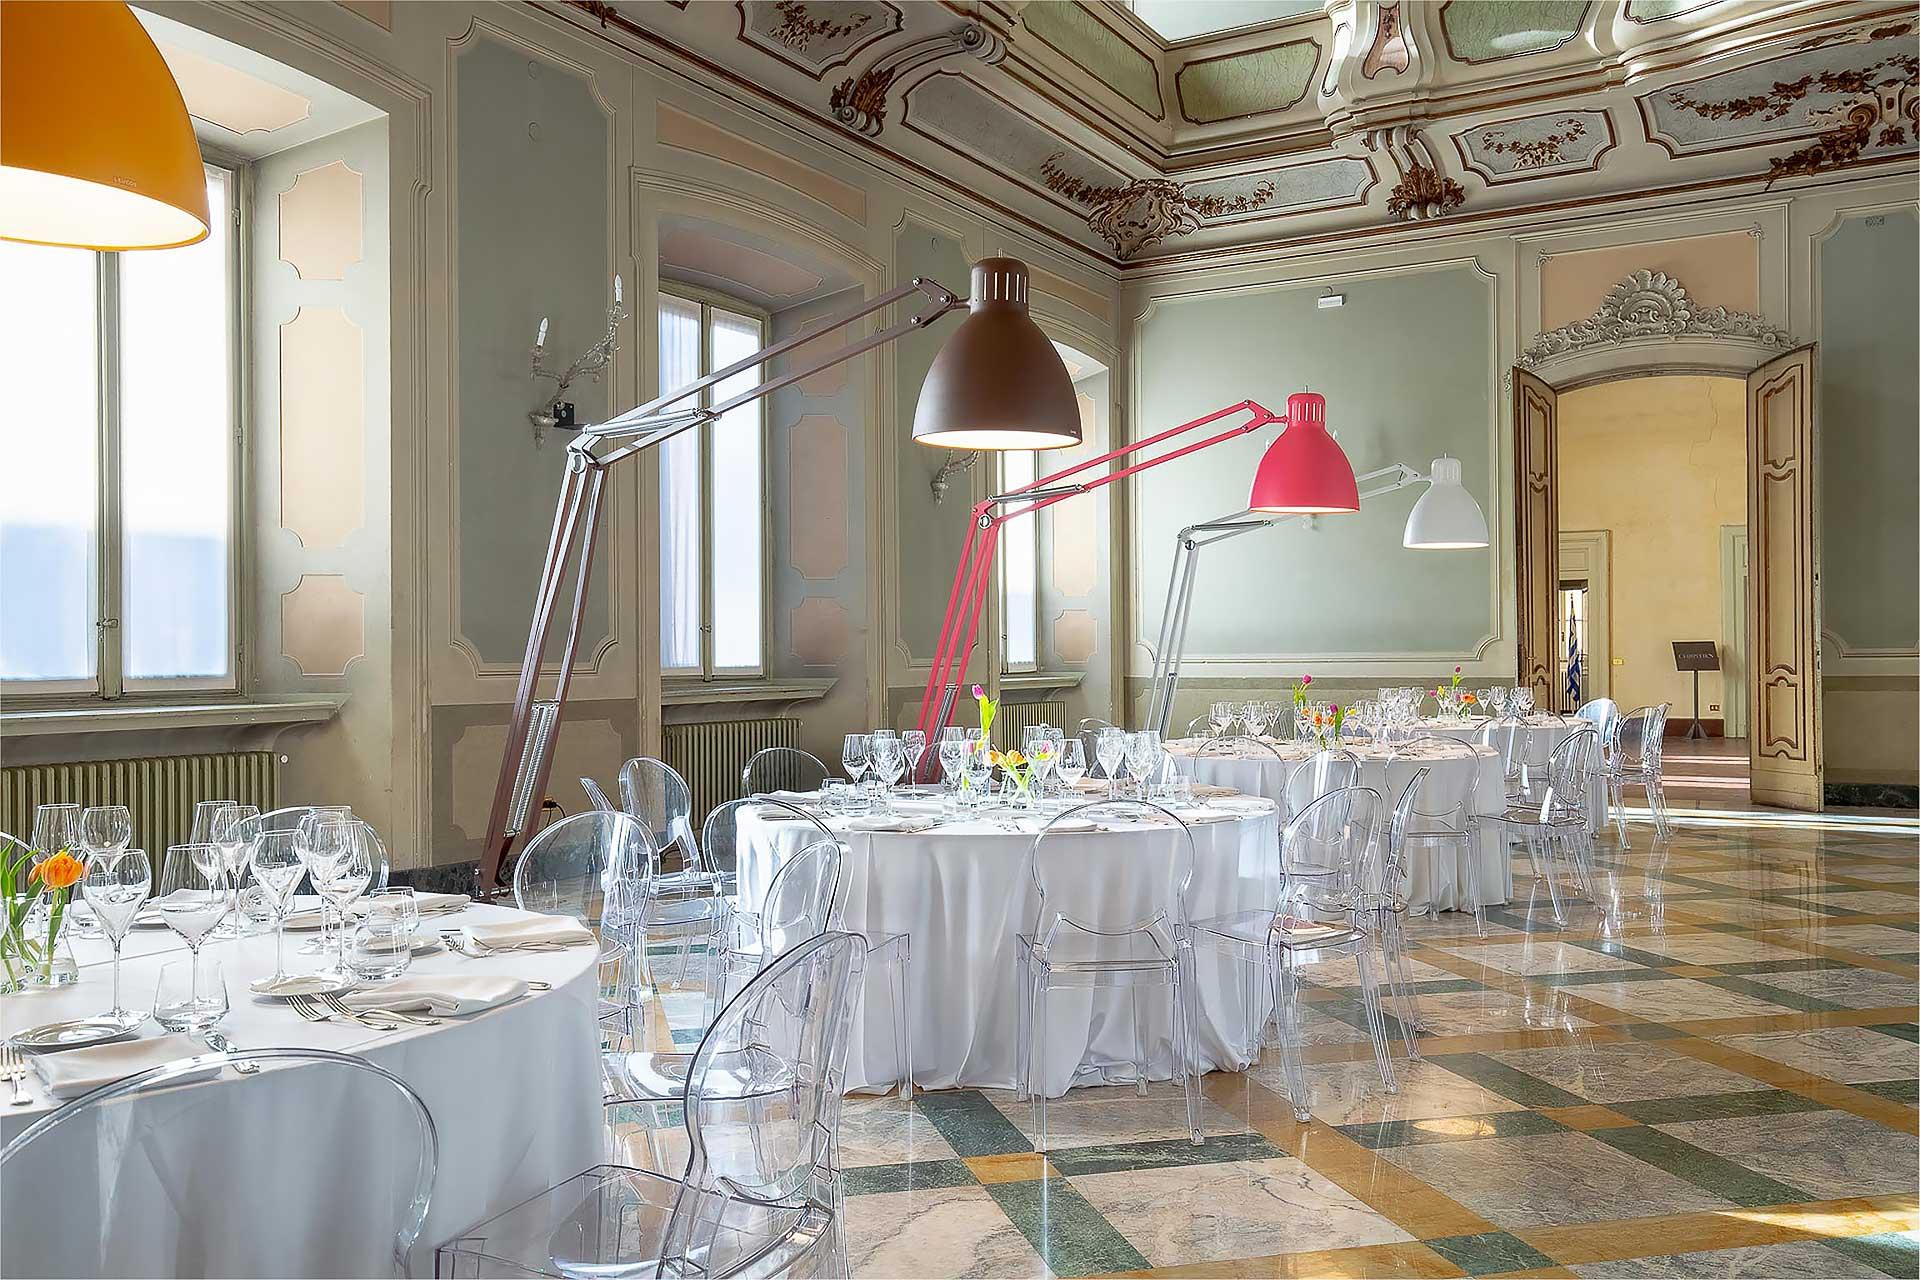 fotografo-interni-Treviso-Venezia